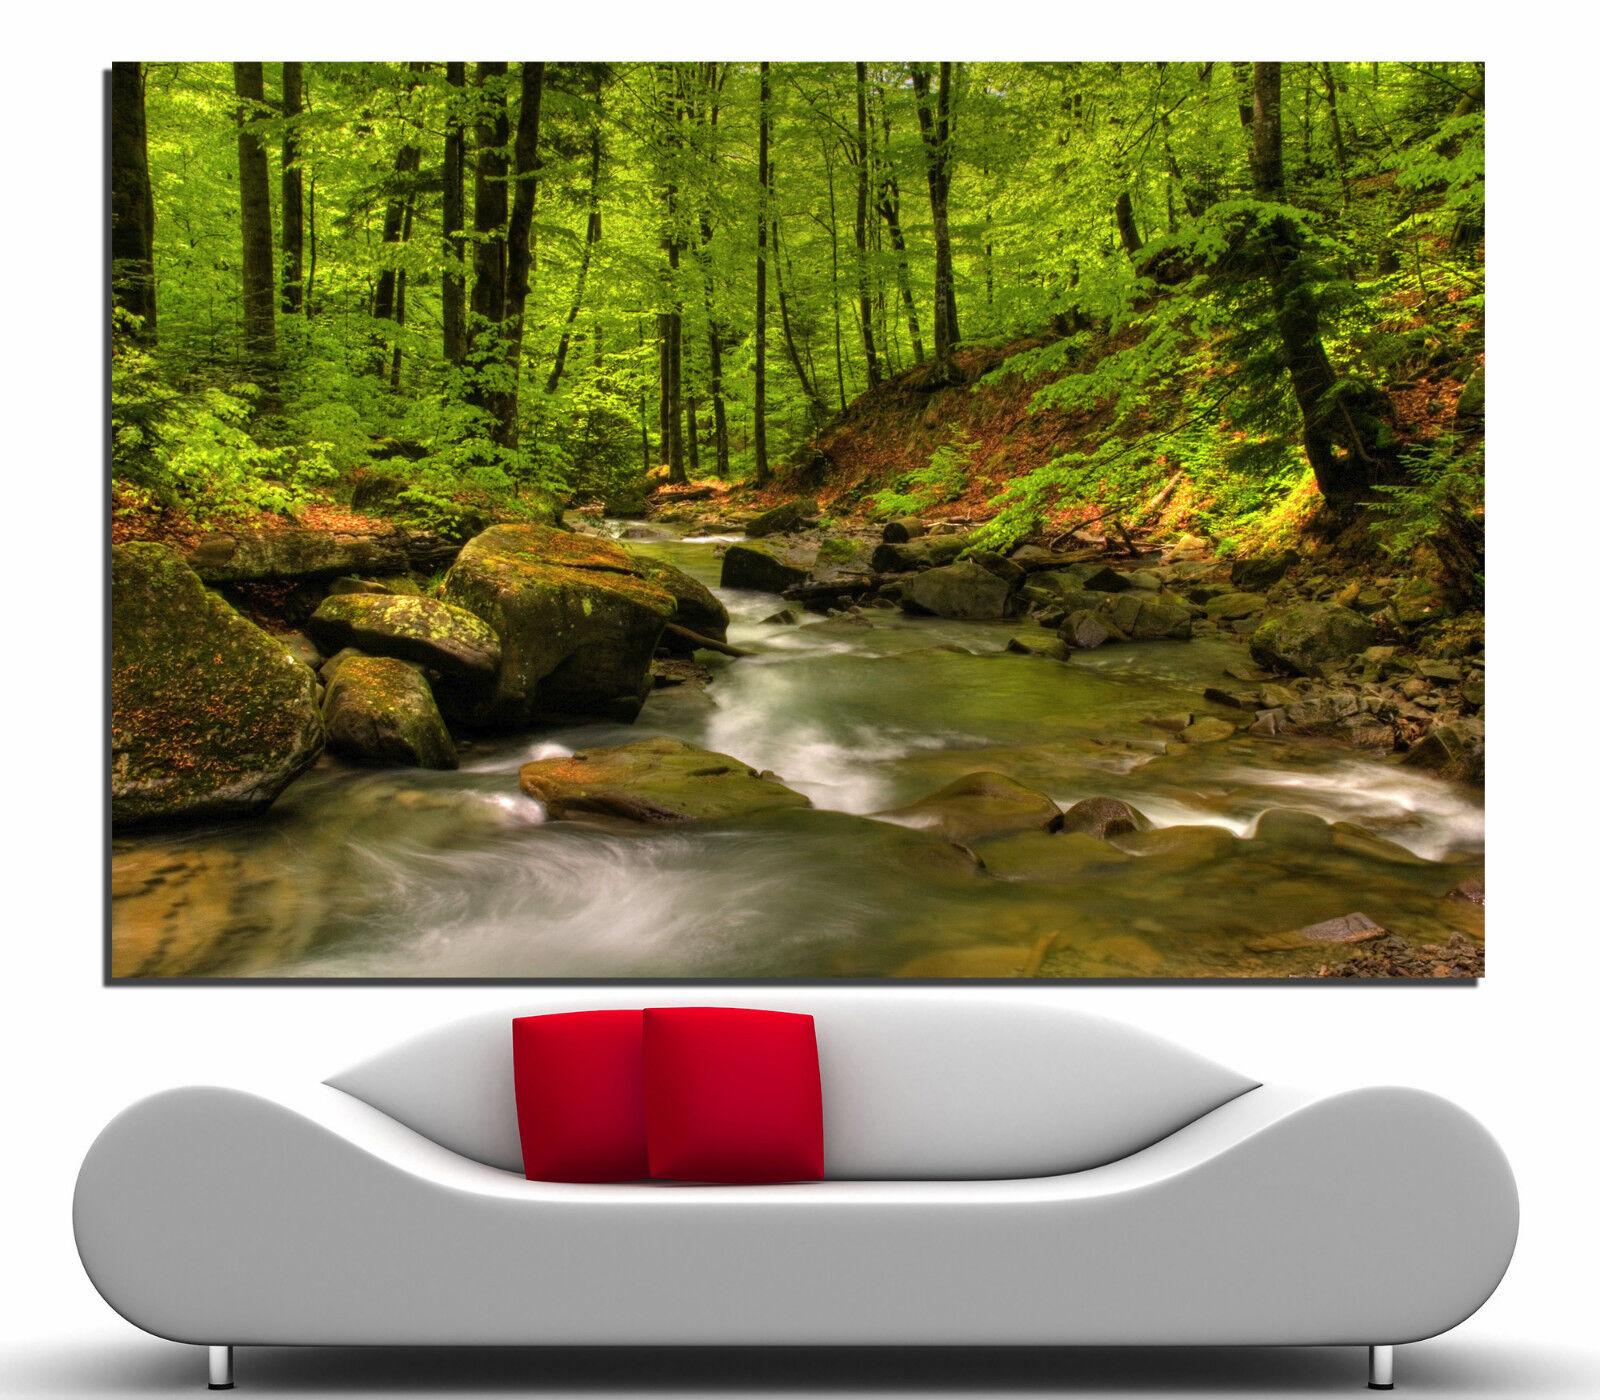 Forest Canvas Print Home Decor Wall Art Landscape Tree Prints Photo Picture 2 1